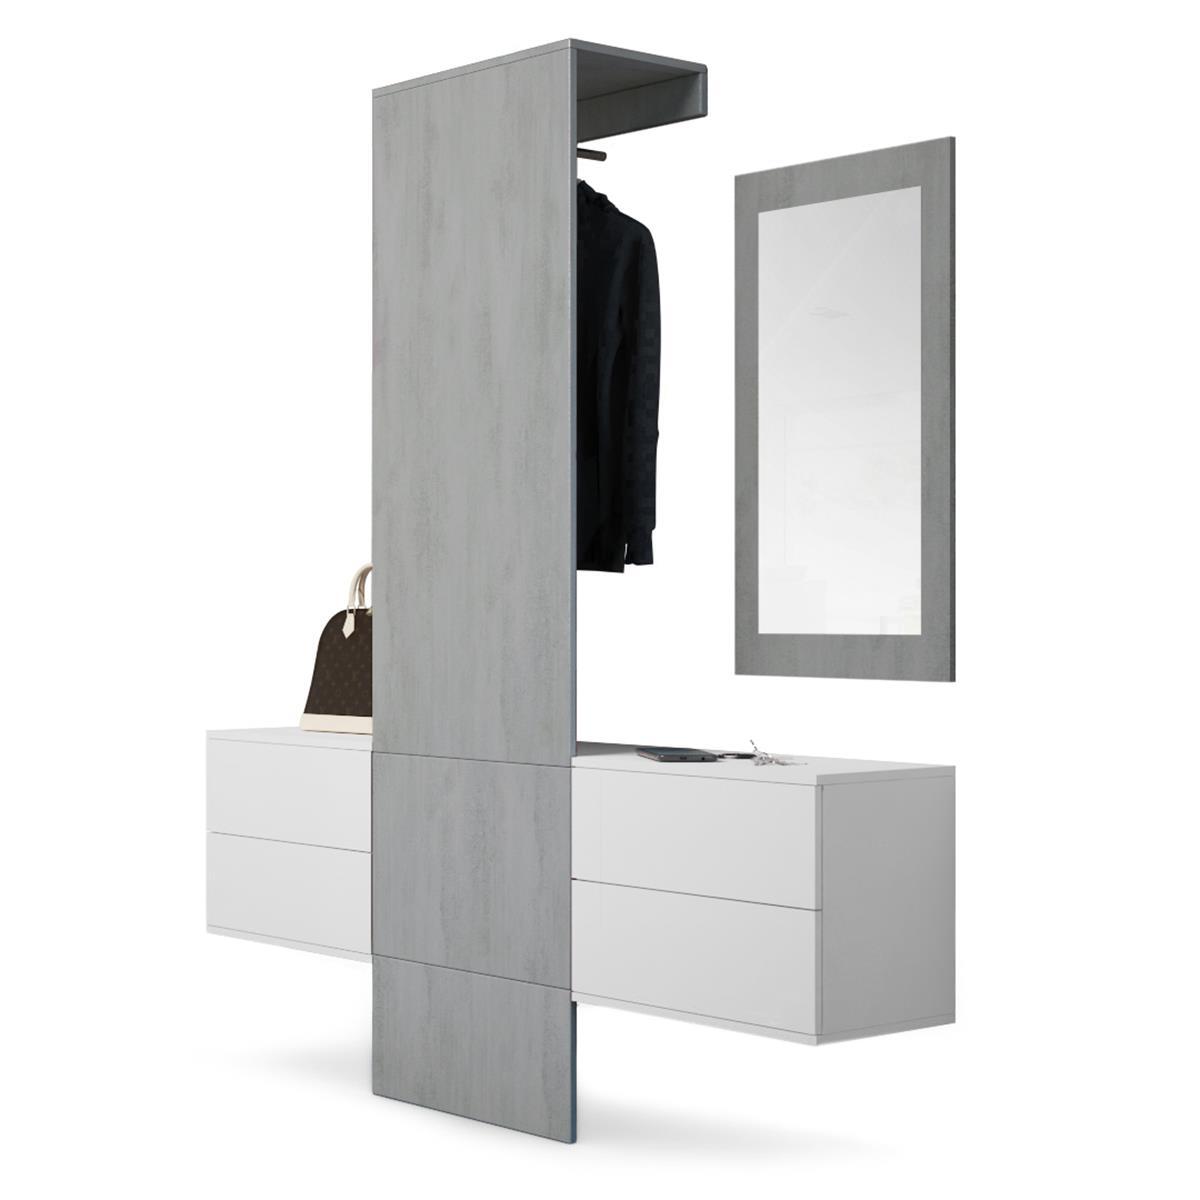 garderobe carlton set 3 beton oxid spiegel beton